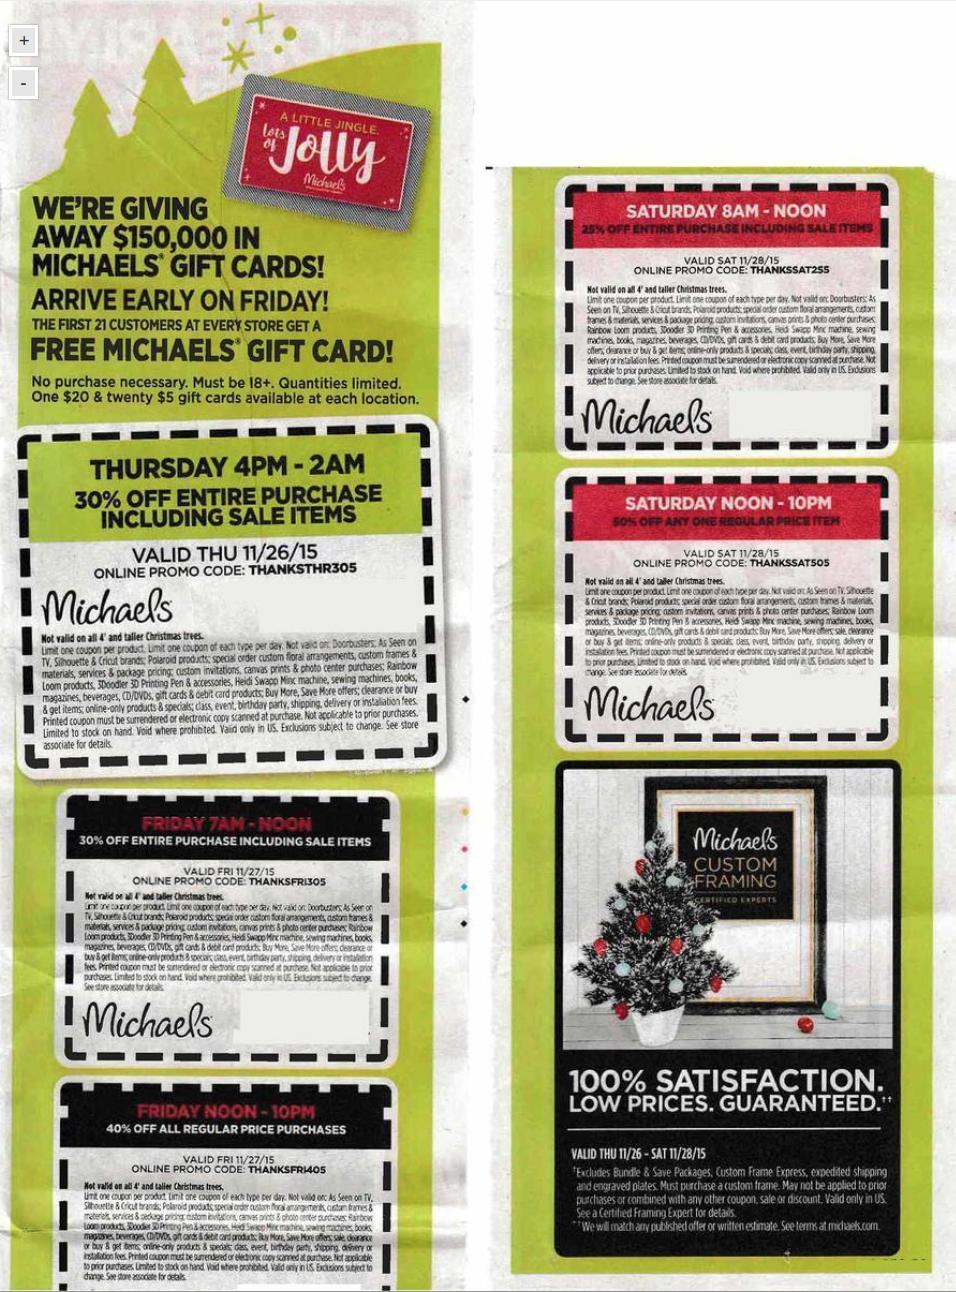 Michaels Black Friday 2018 Sale & Ad - Blacker Friday